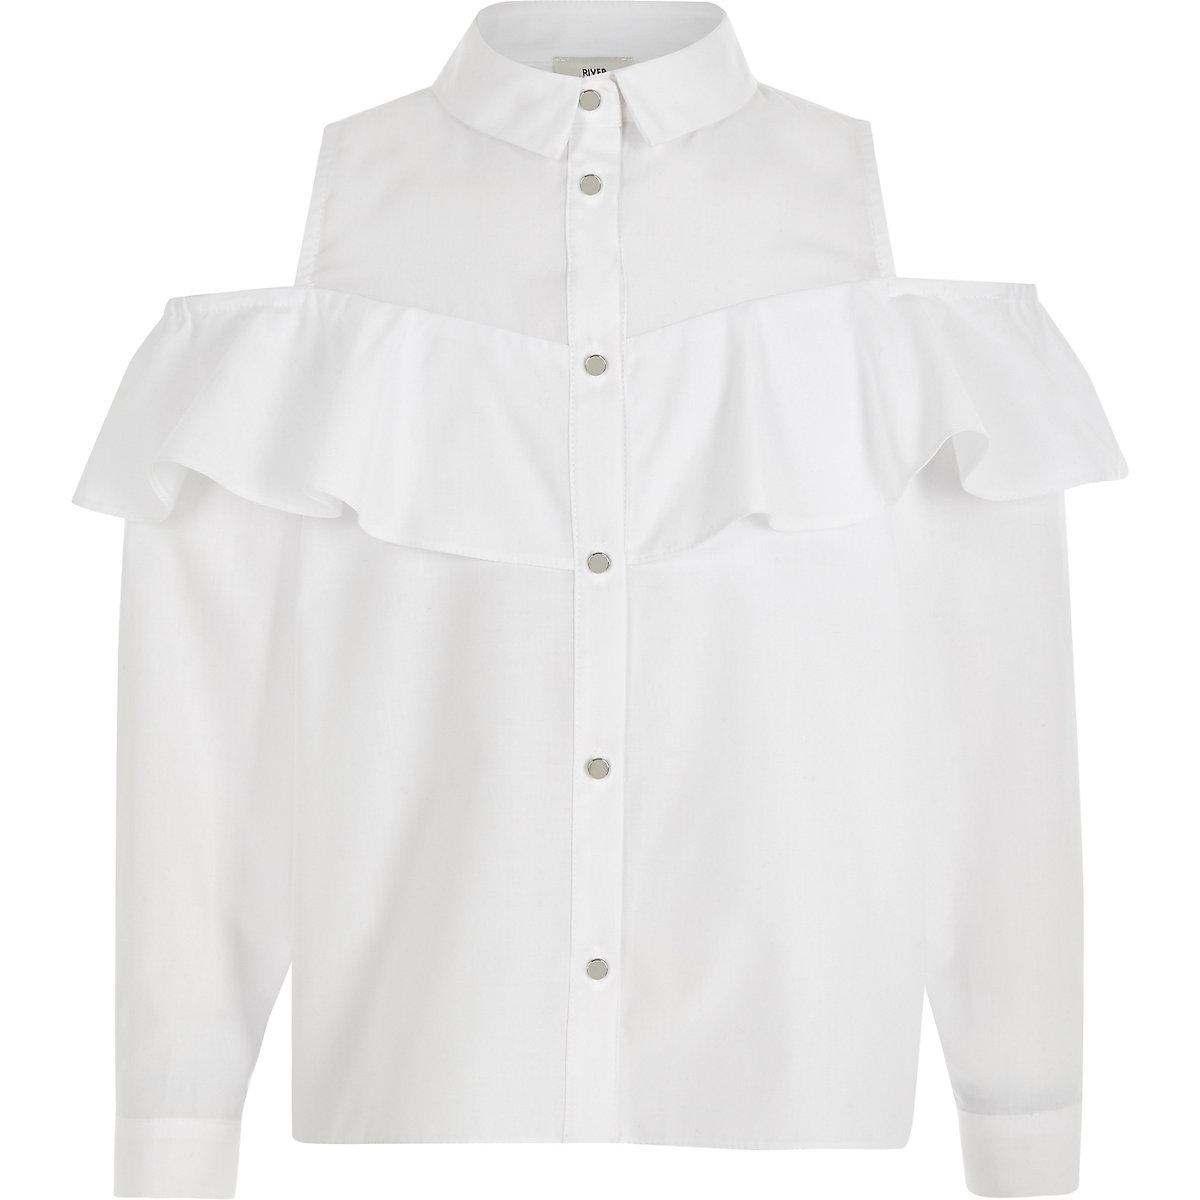 Girls white frill bardot shirt